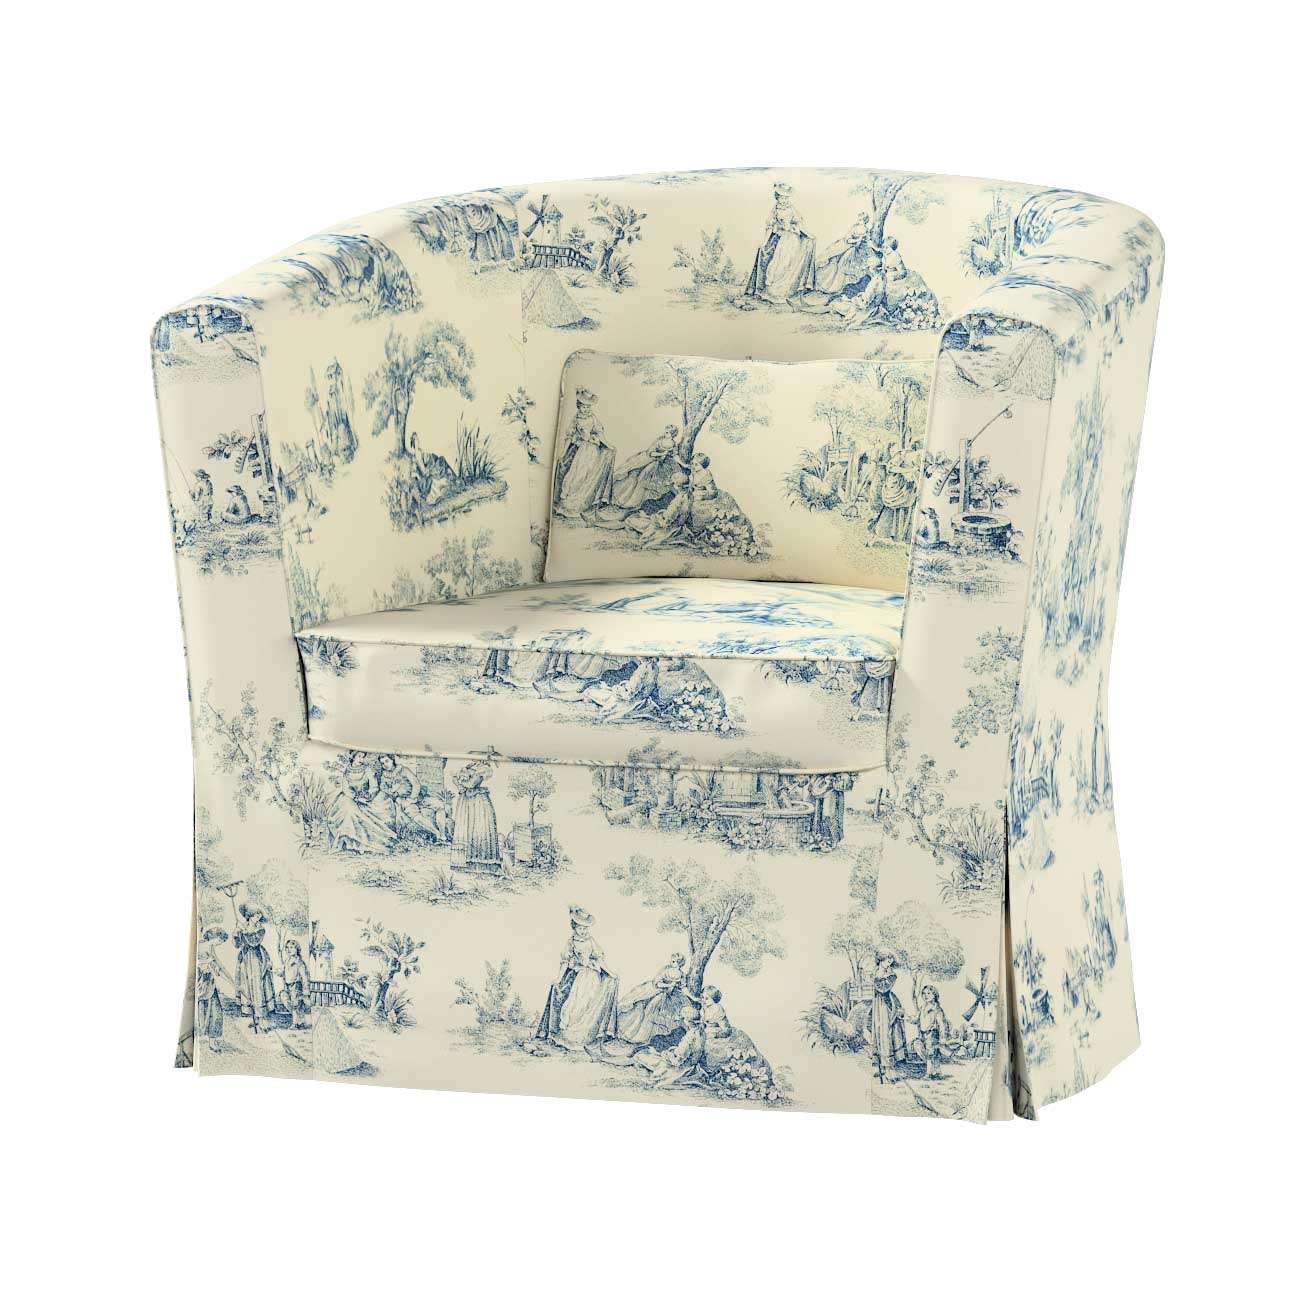 Pokrowiec na fotel Ektorp Tullsta fotel Ektorp Tullsta w kolekcji Avinon, tkanina: 132-66